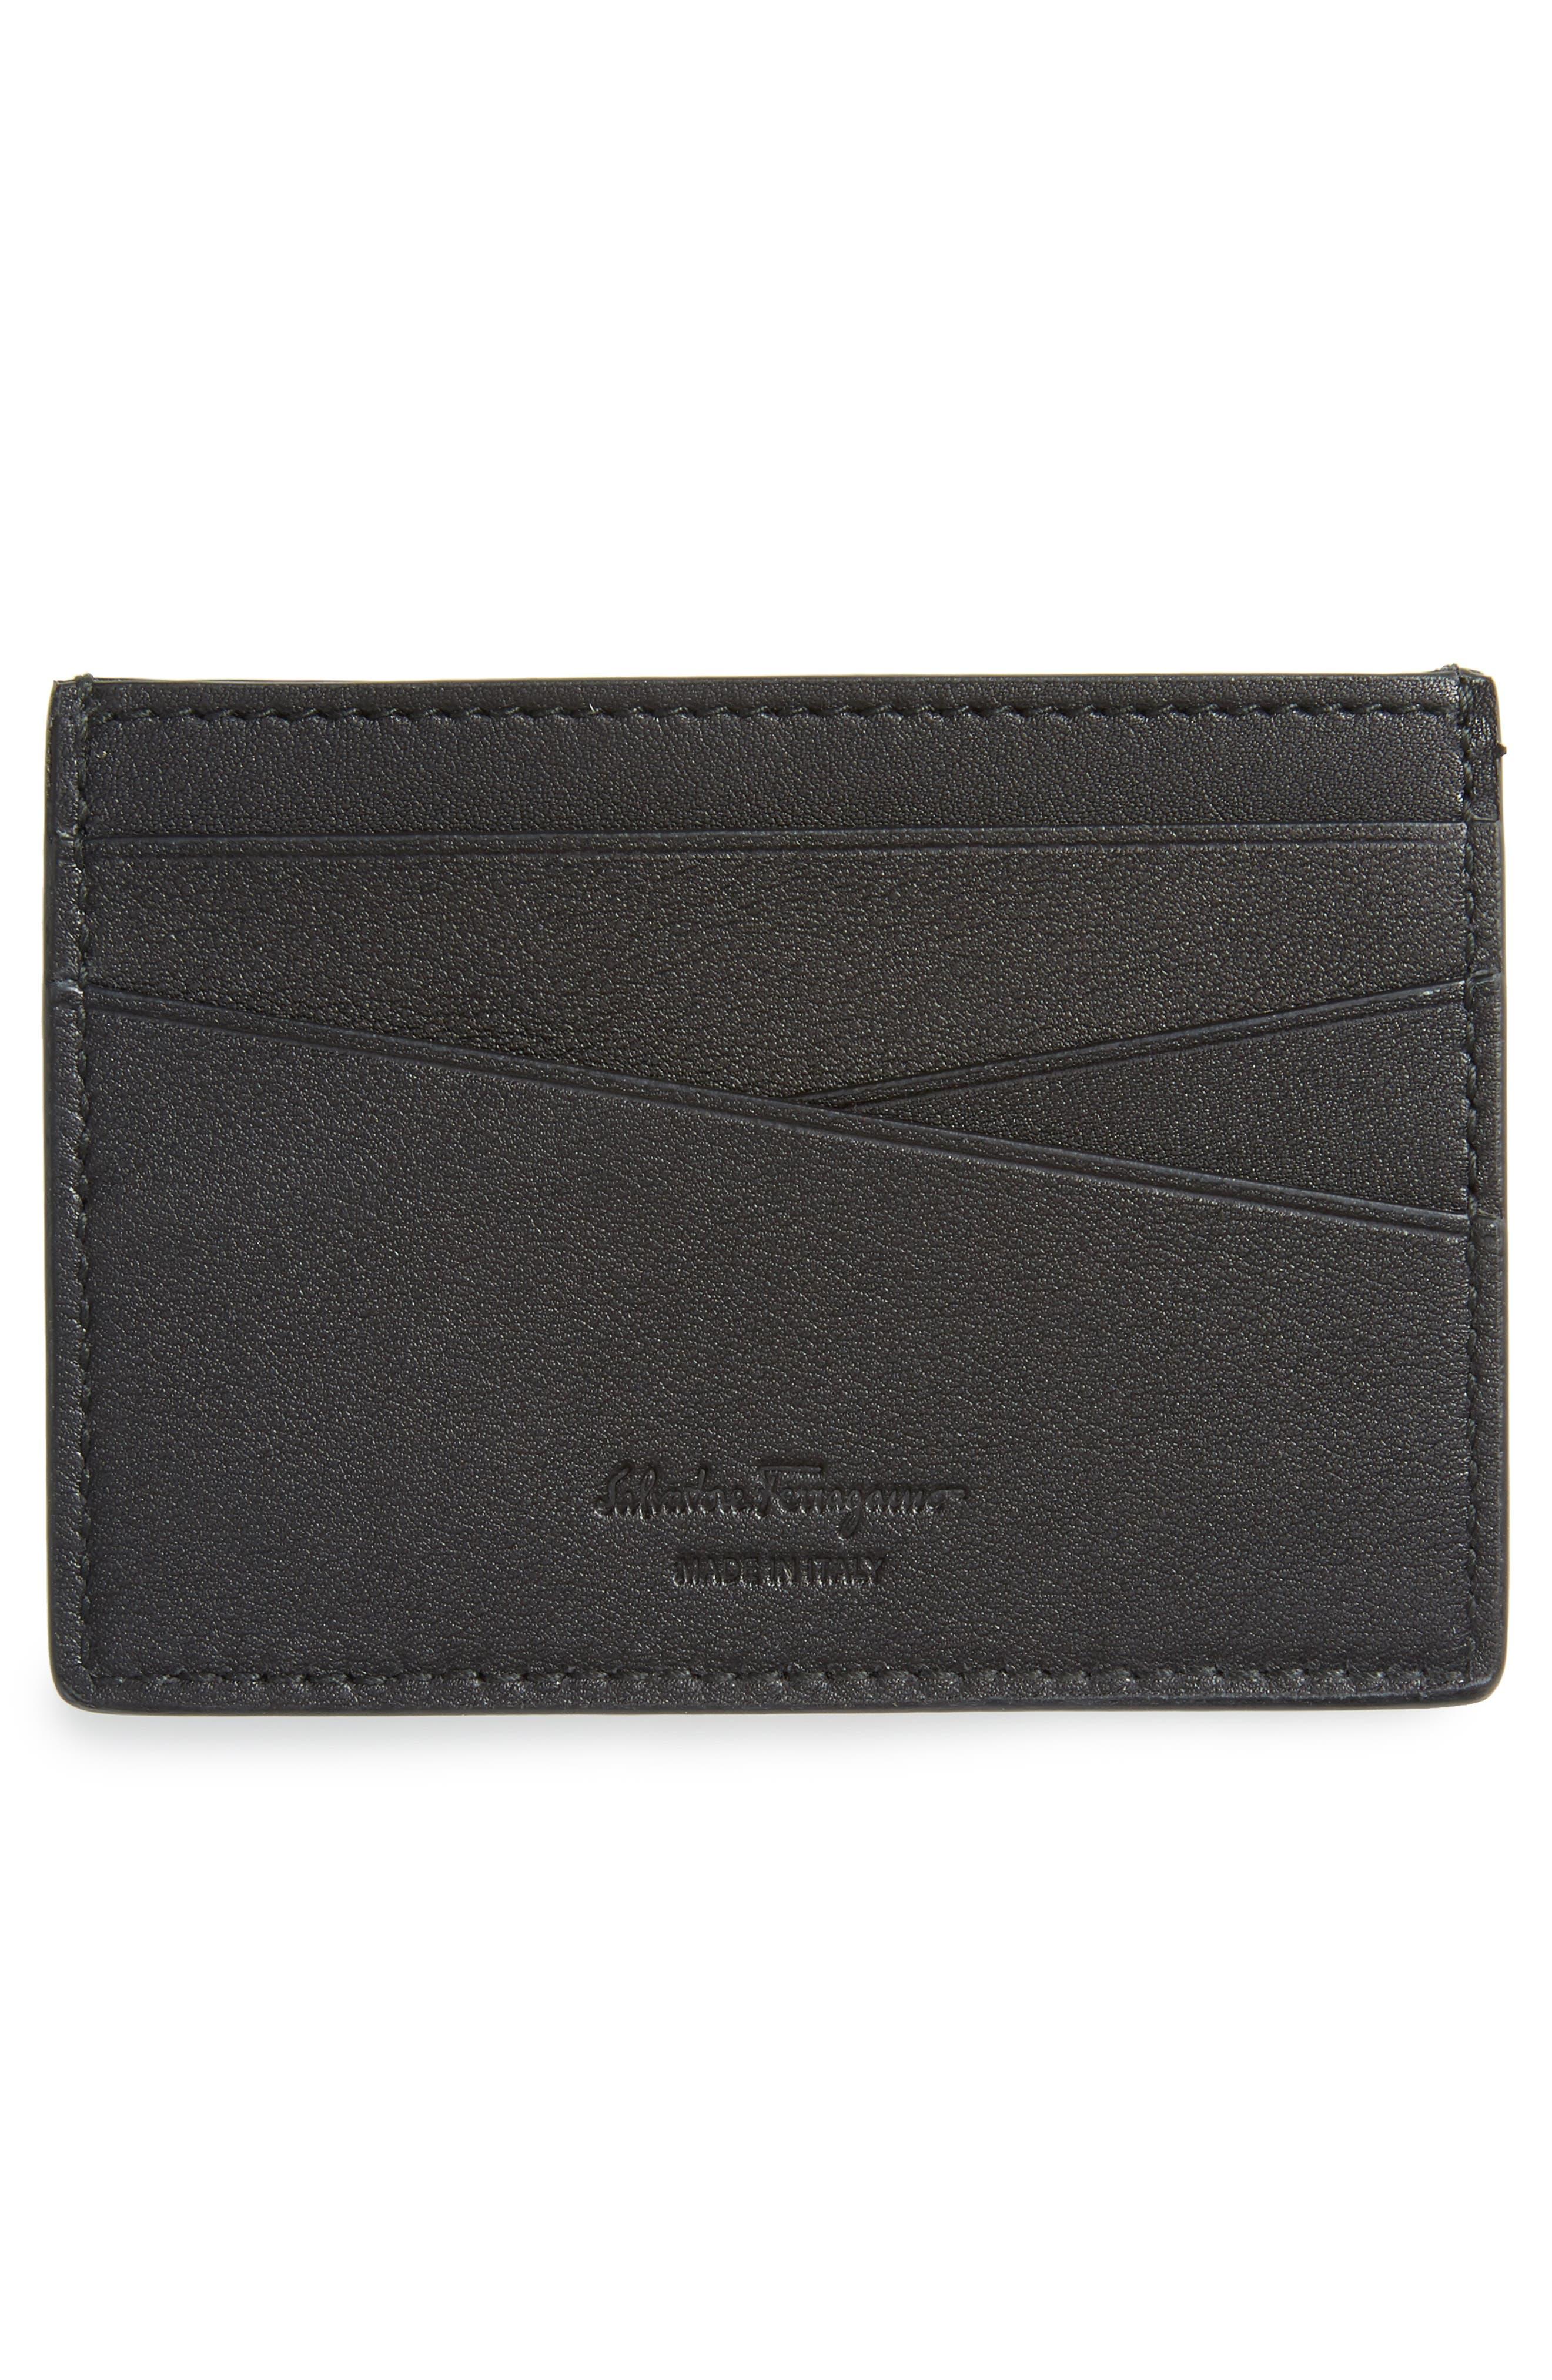 Calfskin Leather Card Case,                             Alternate thumbnail 2, color,                             BLACK